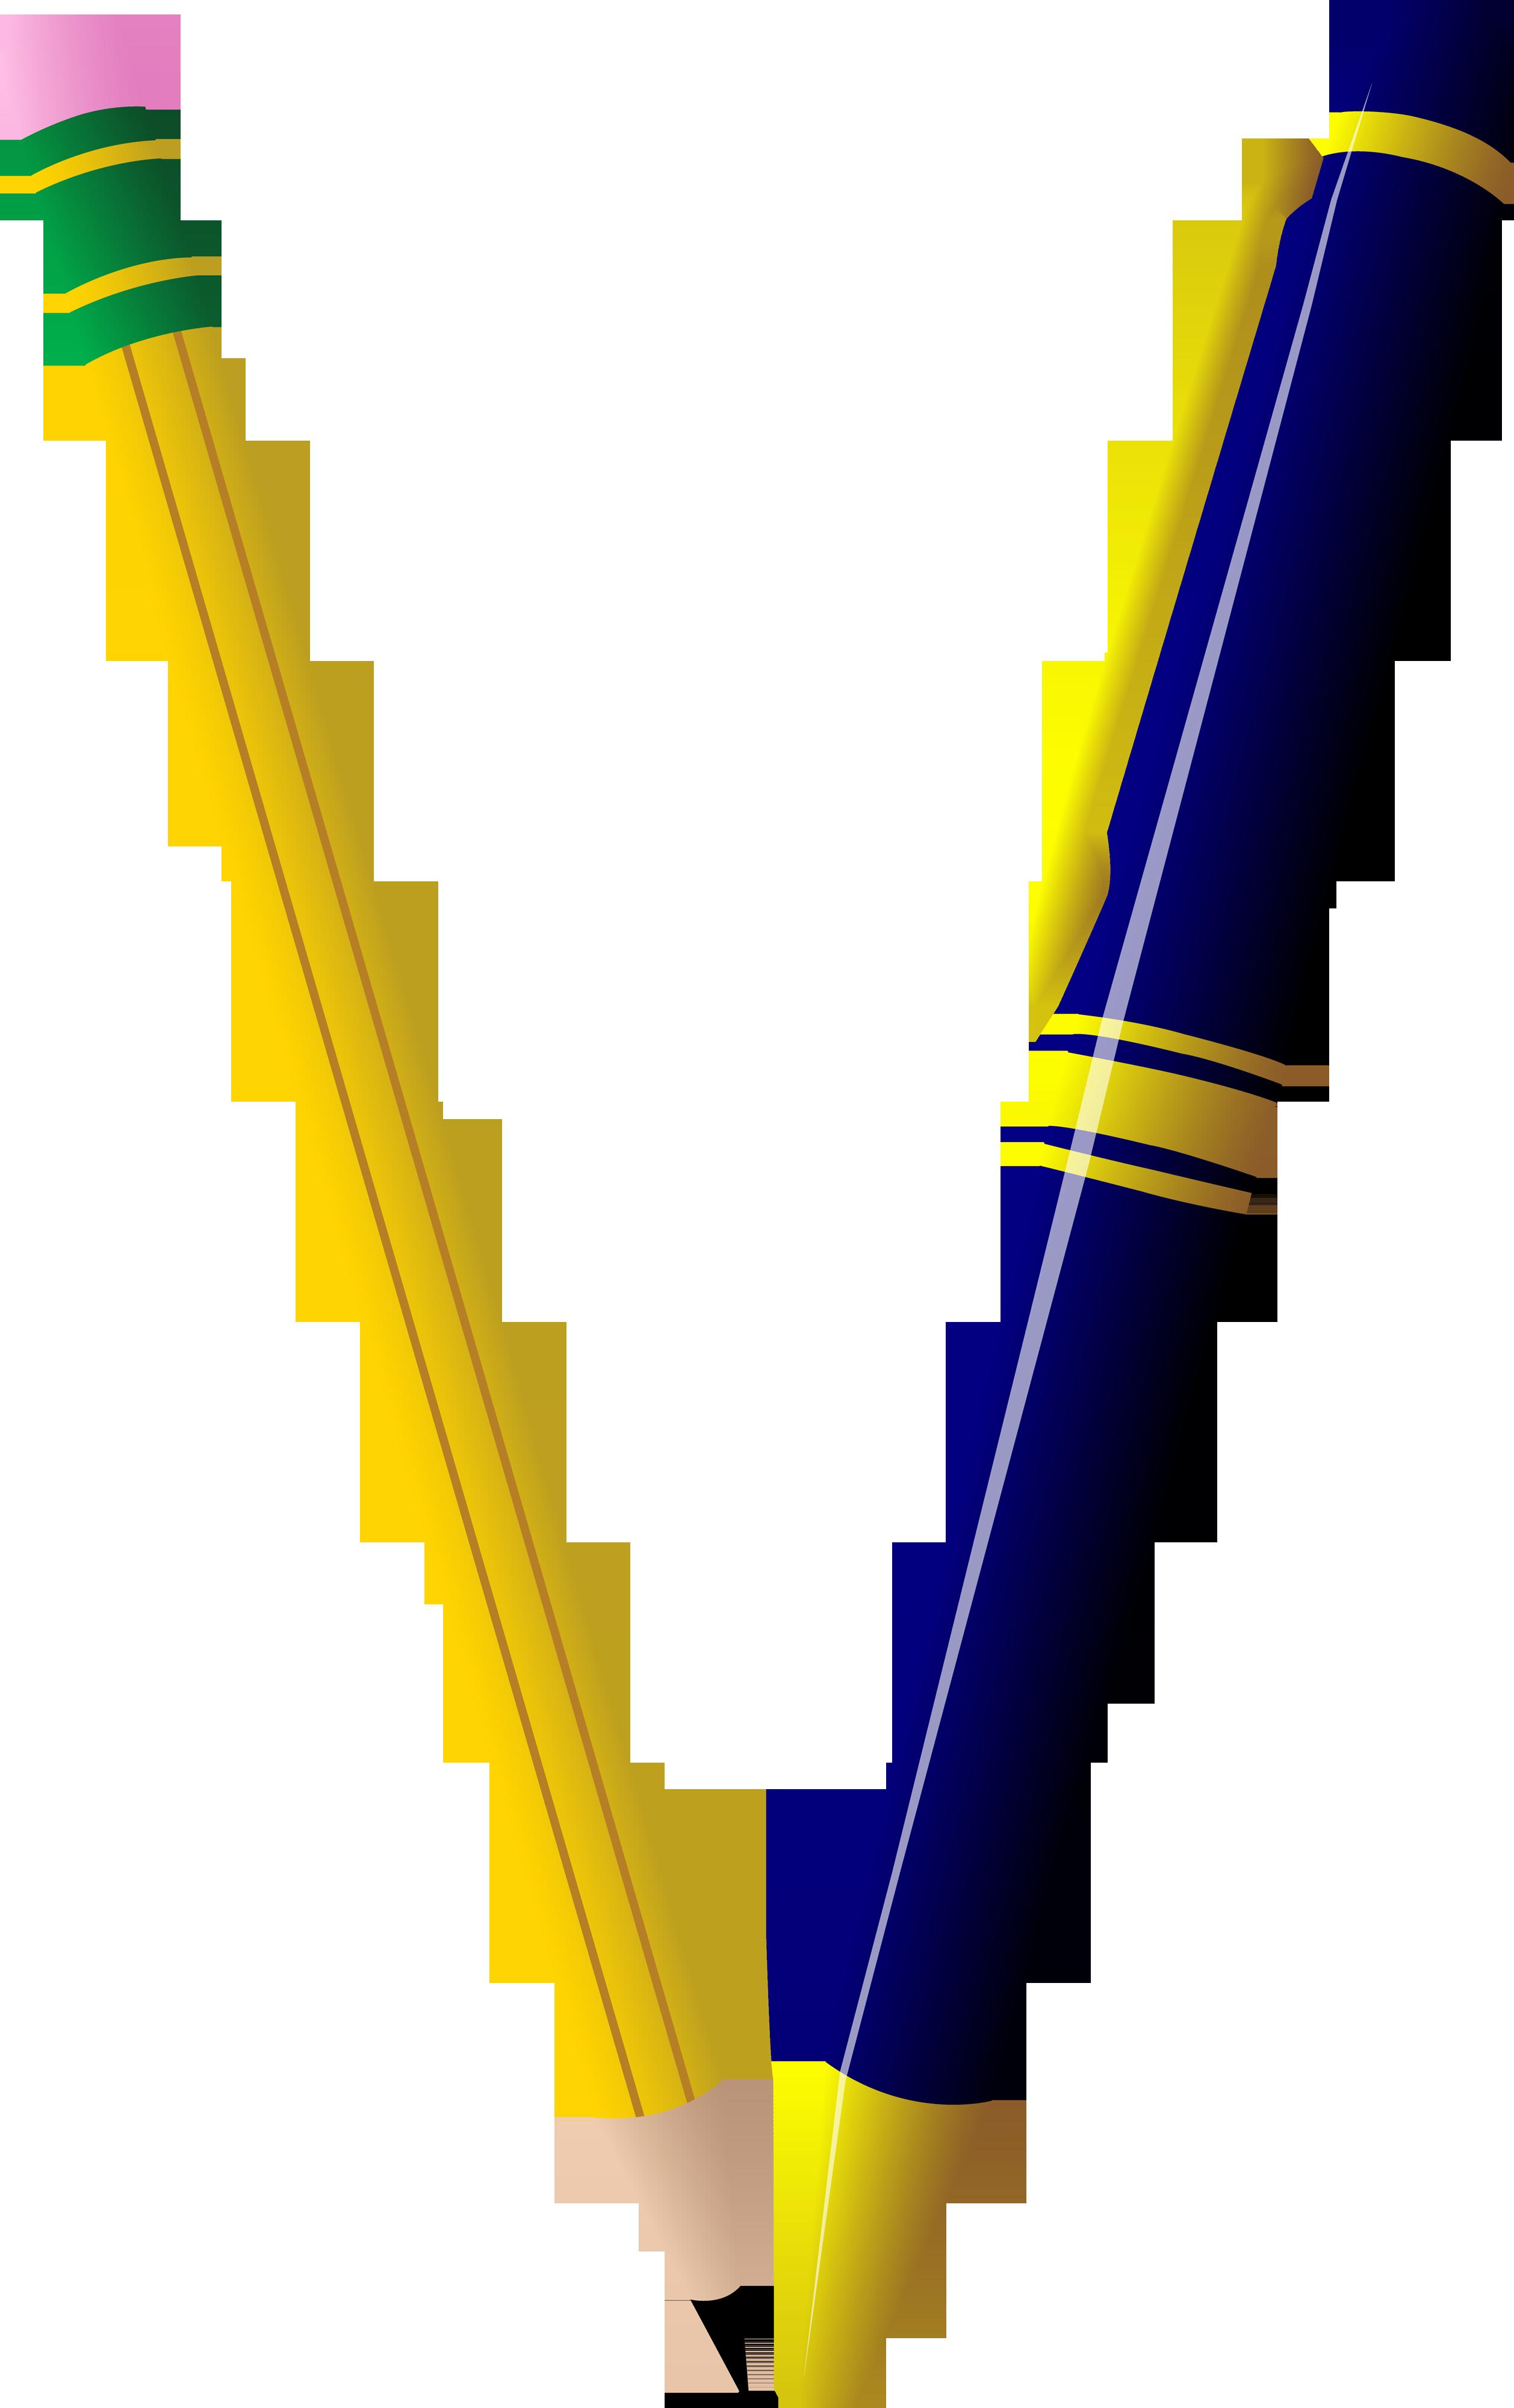 Free Pencil Clipart, Download Free Clip Art, Free Clip Art.